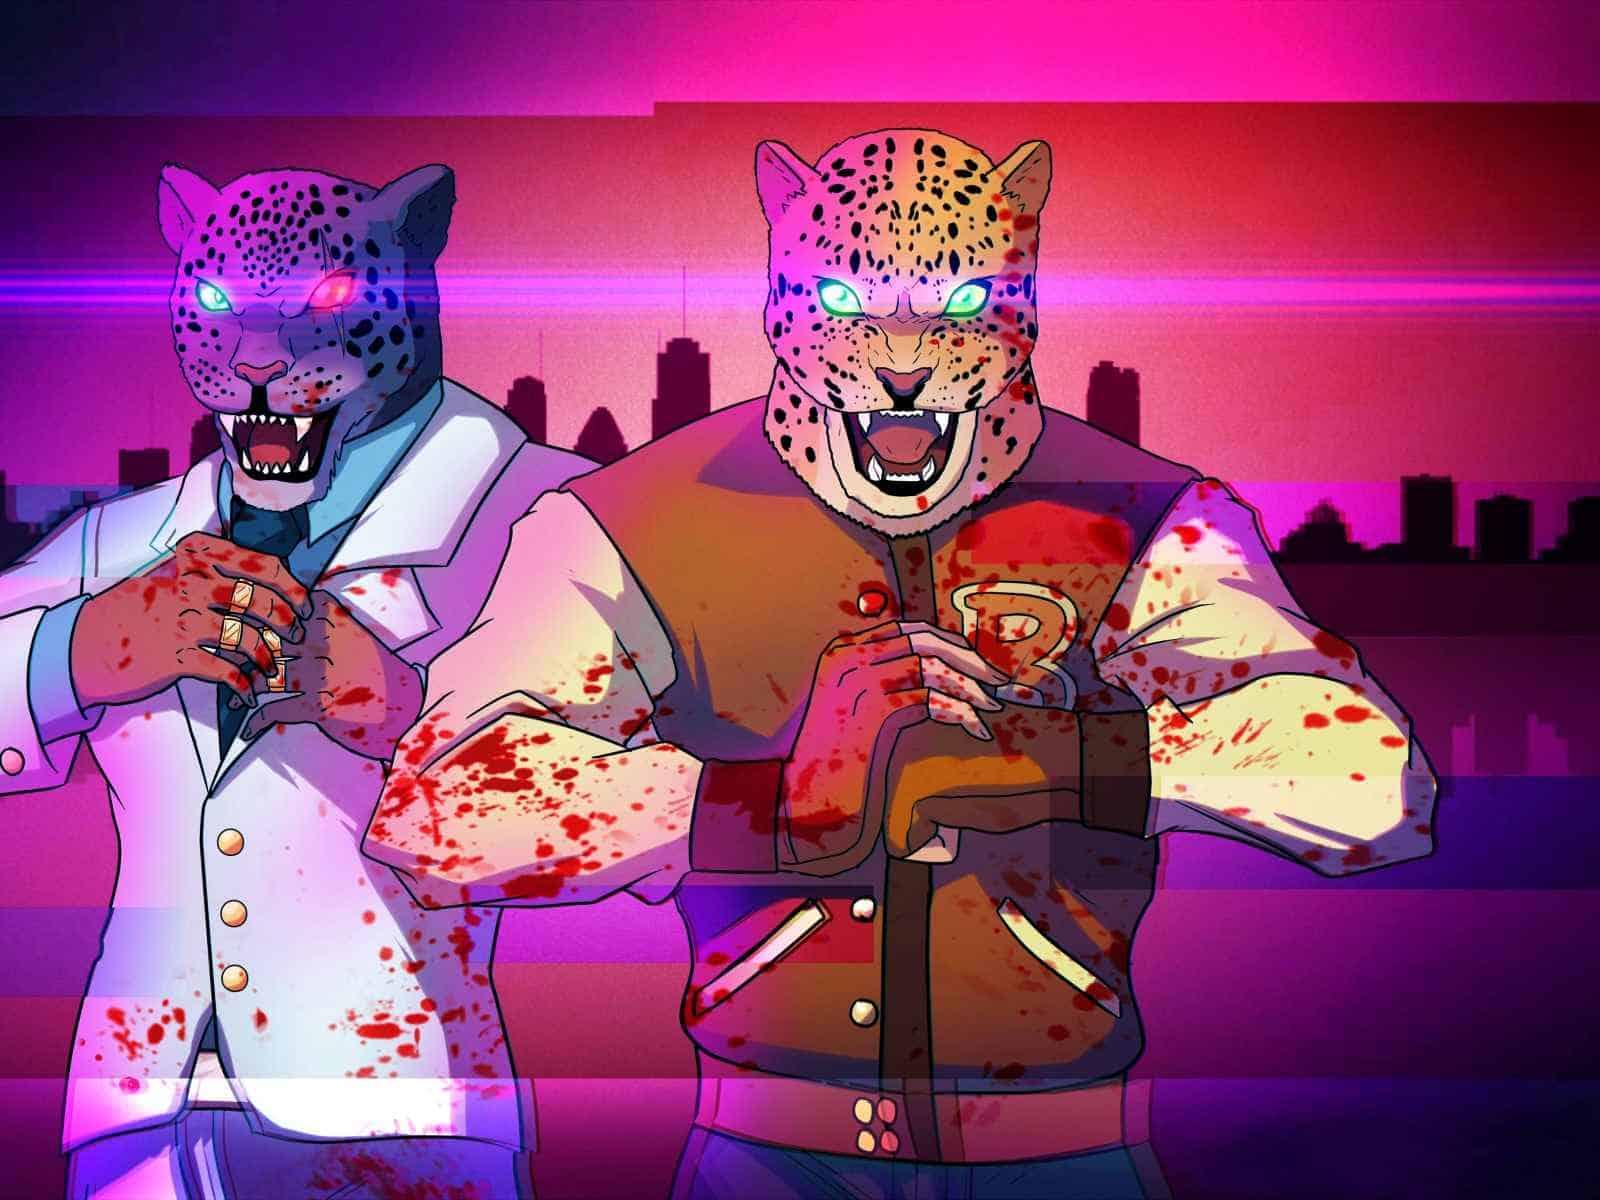 Tekken, Hotline miami, Armor king 1600×1200 HD Background